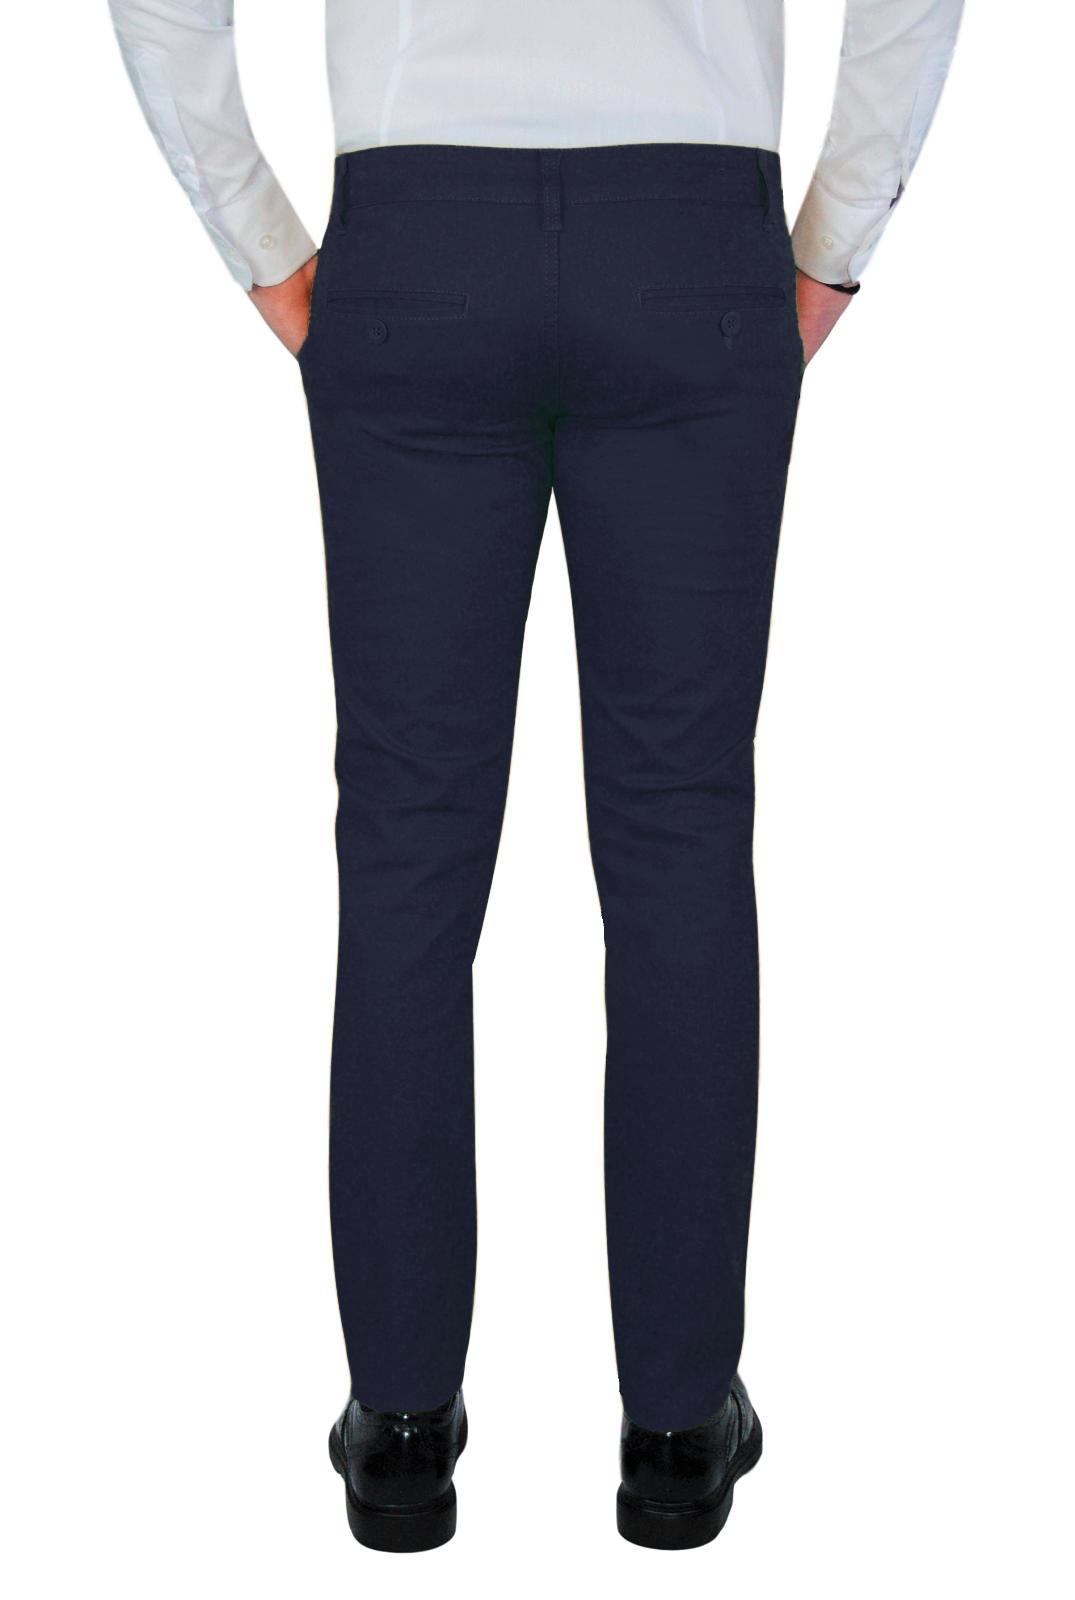 Pantalone-Uomo-Invernale-Slim-Fit-Chino-tasca-america-Cotone-Blu-Nero-Verde miniatura 17